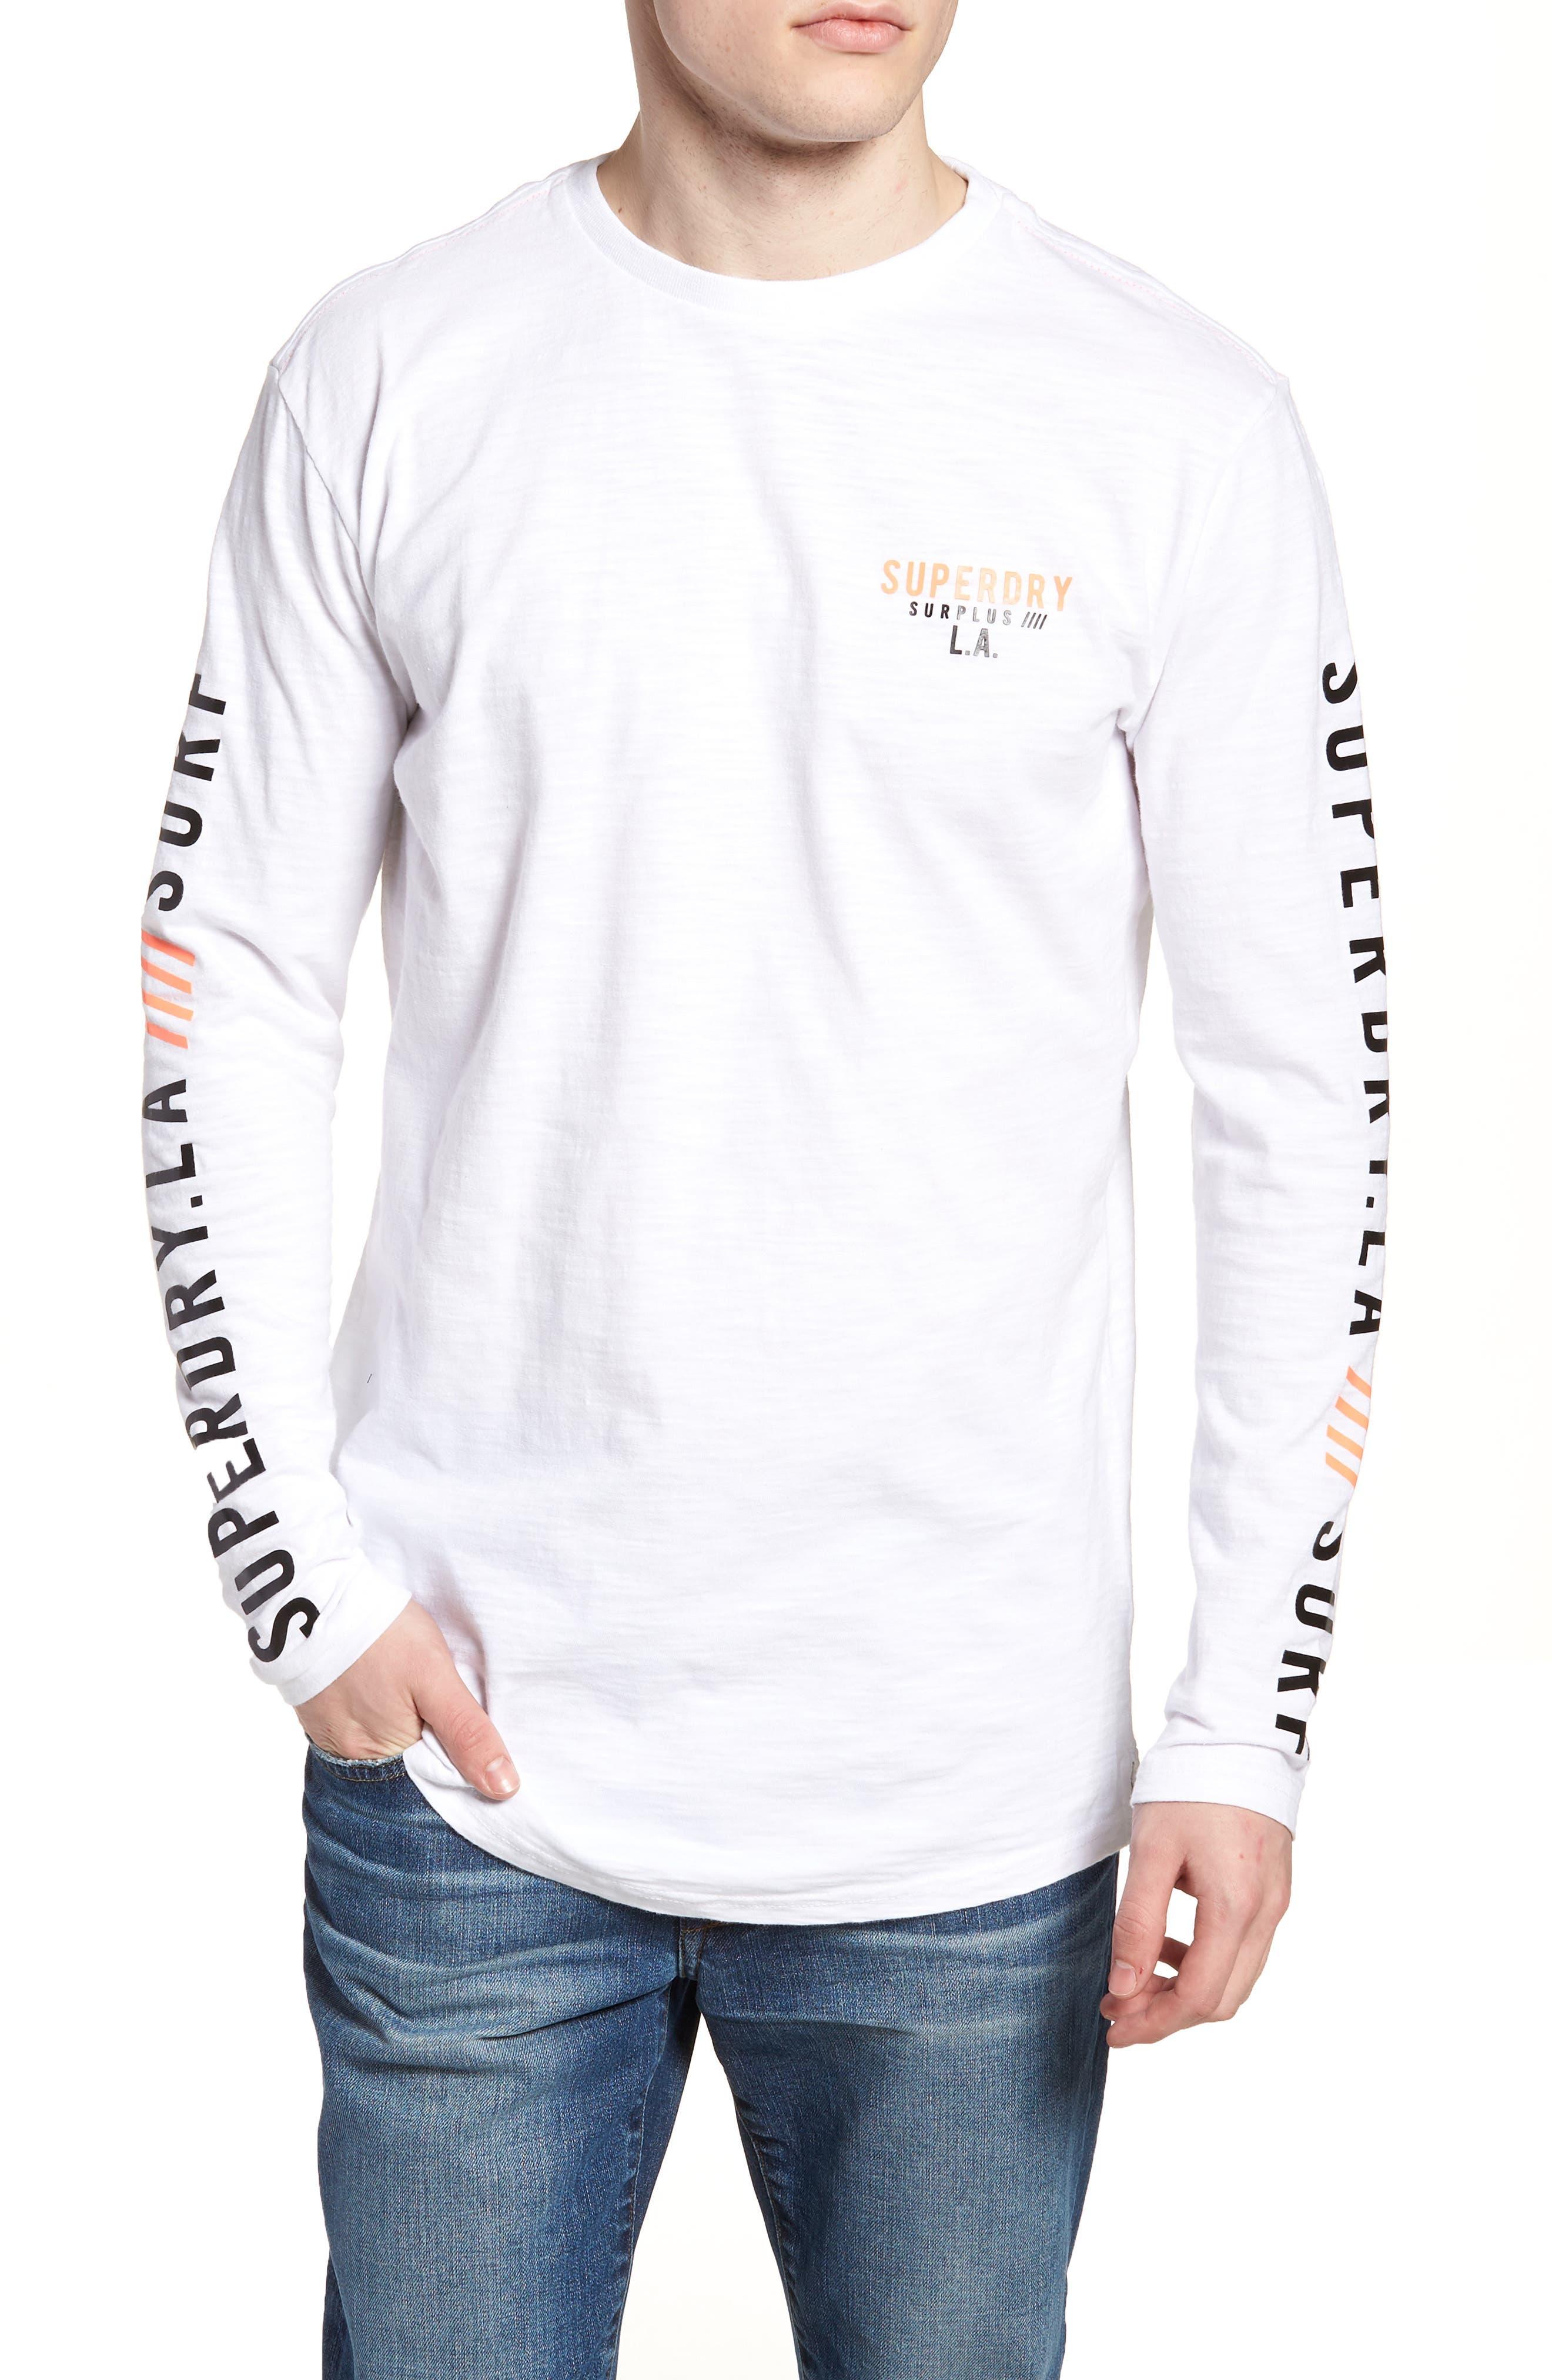 Main Image - Superdry Surplus Goods T-Shirt